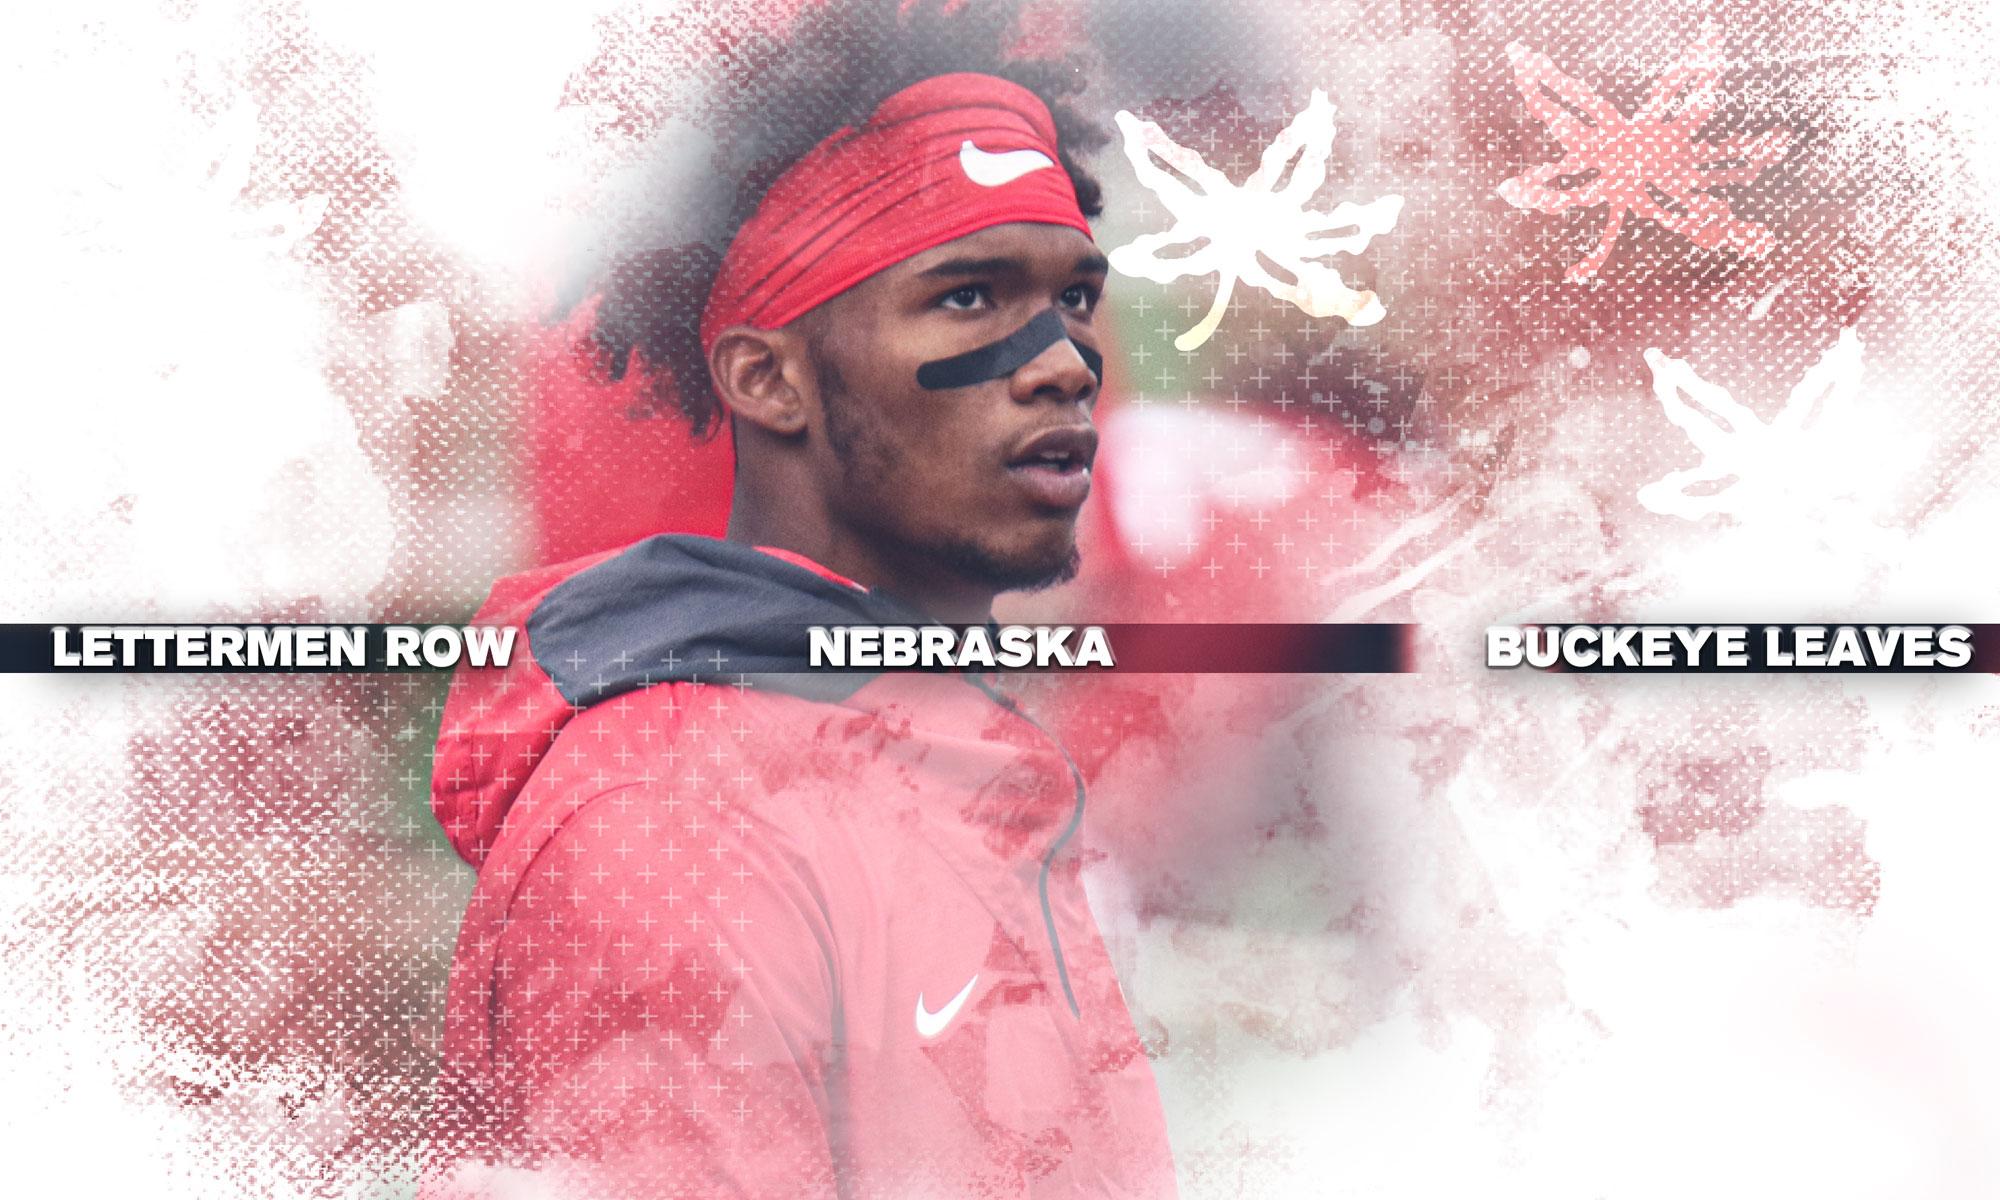 Nebraska-Buckeye-Leaves-2020---home-game